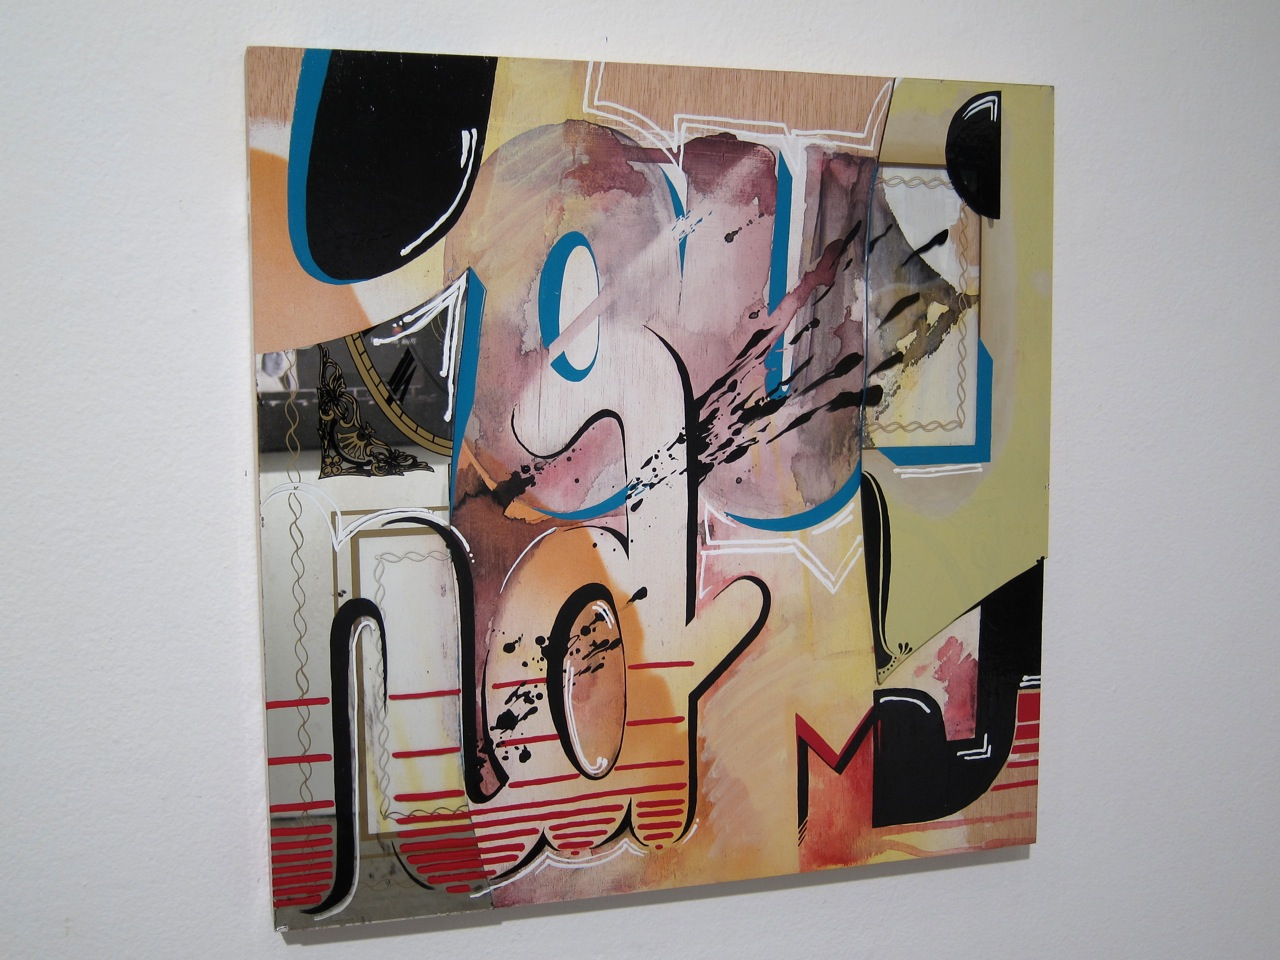 Levine Carlo McCormick AM 01